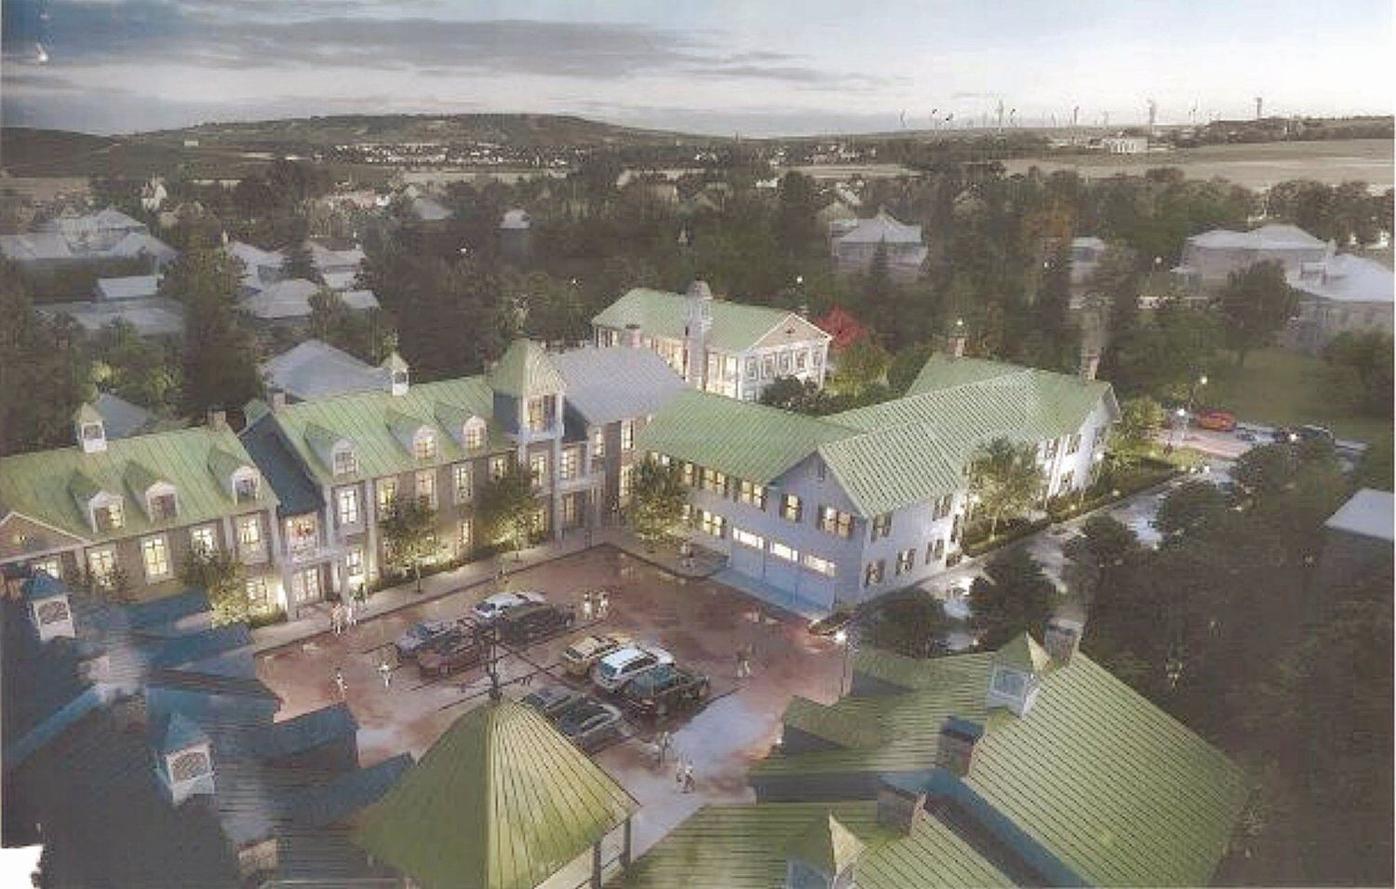 Renovation/construction project would transform portion of Lenox downtown village